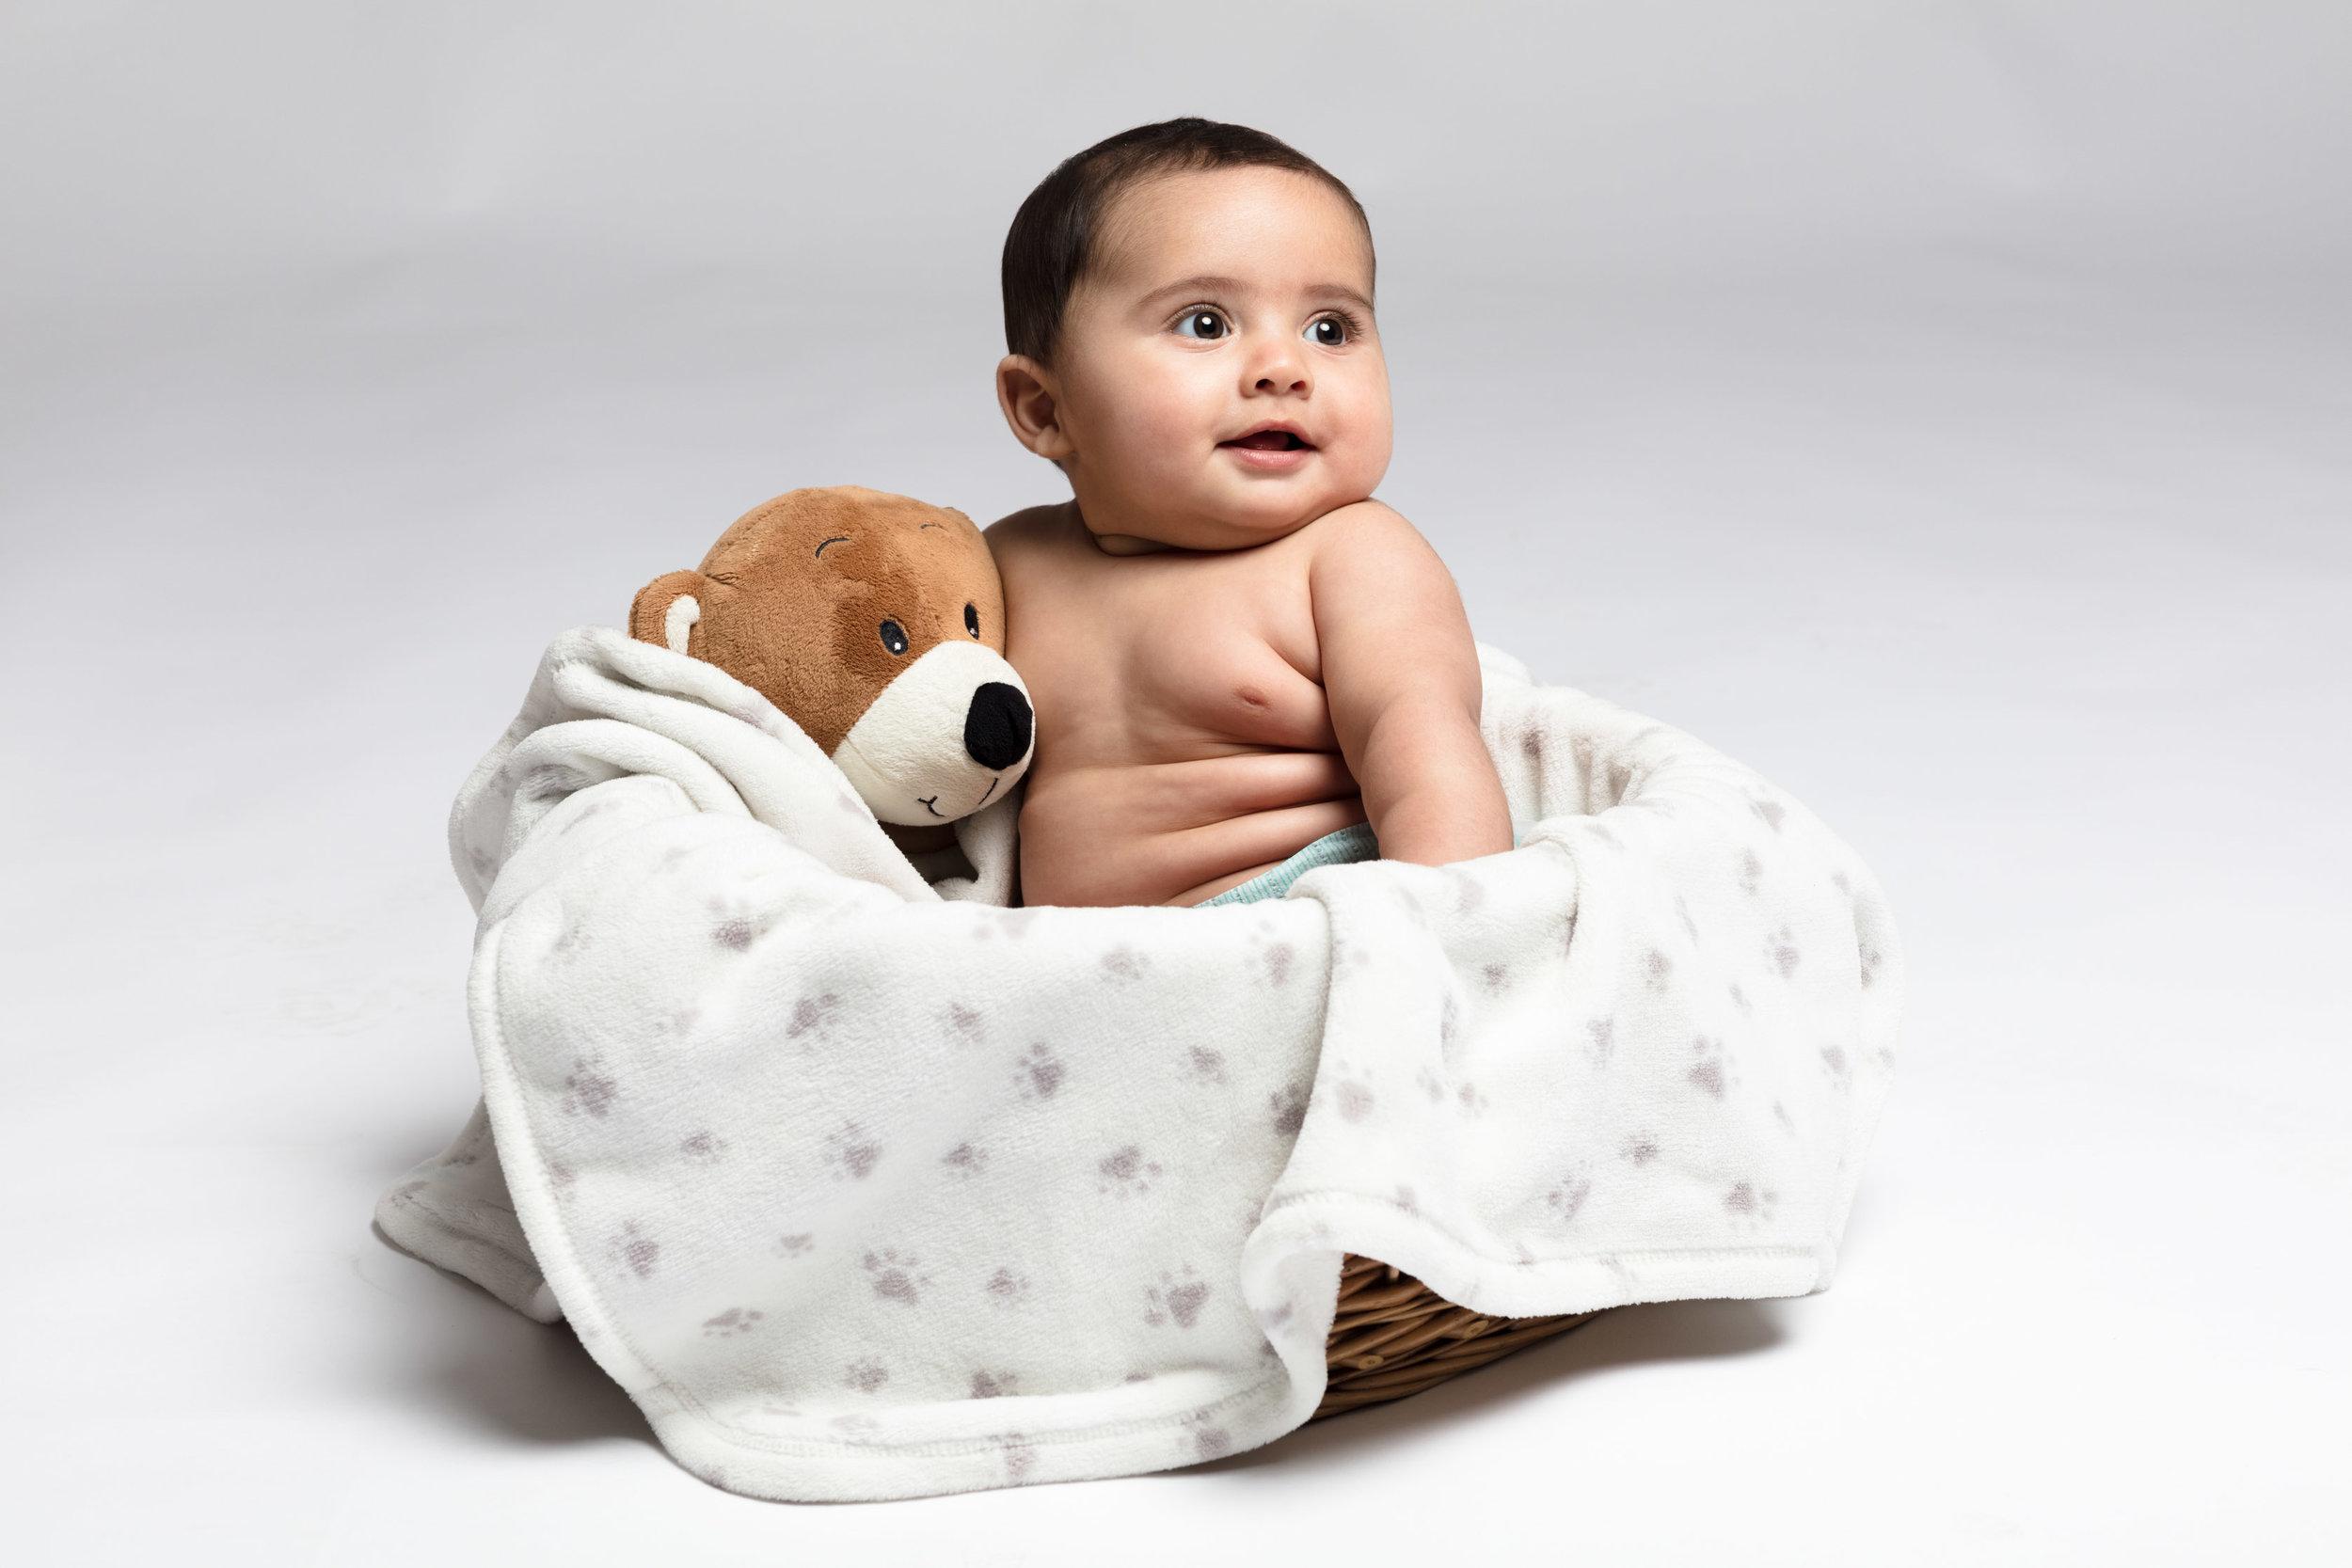 seance-photo-bebe.jpg